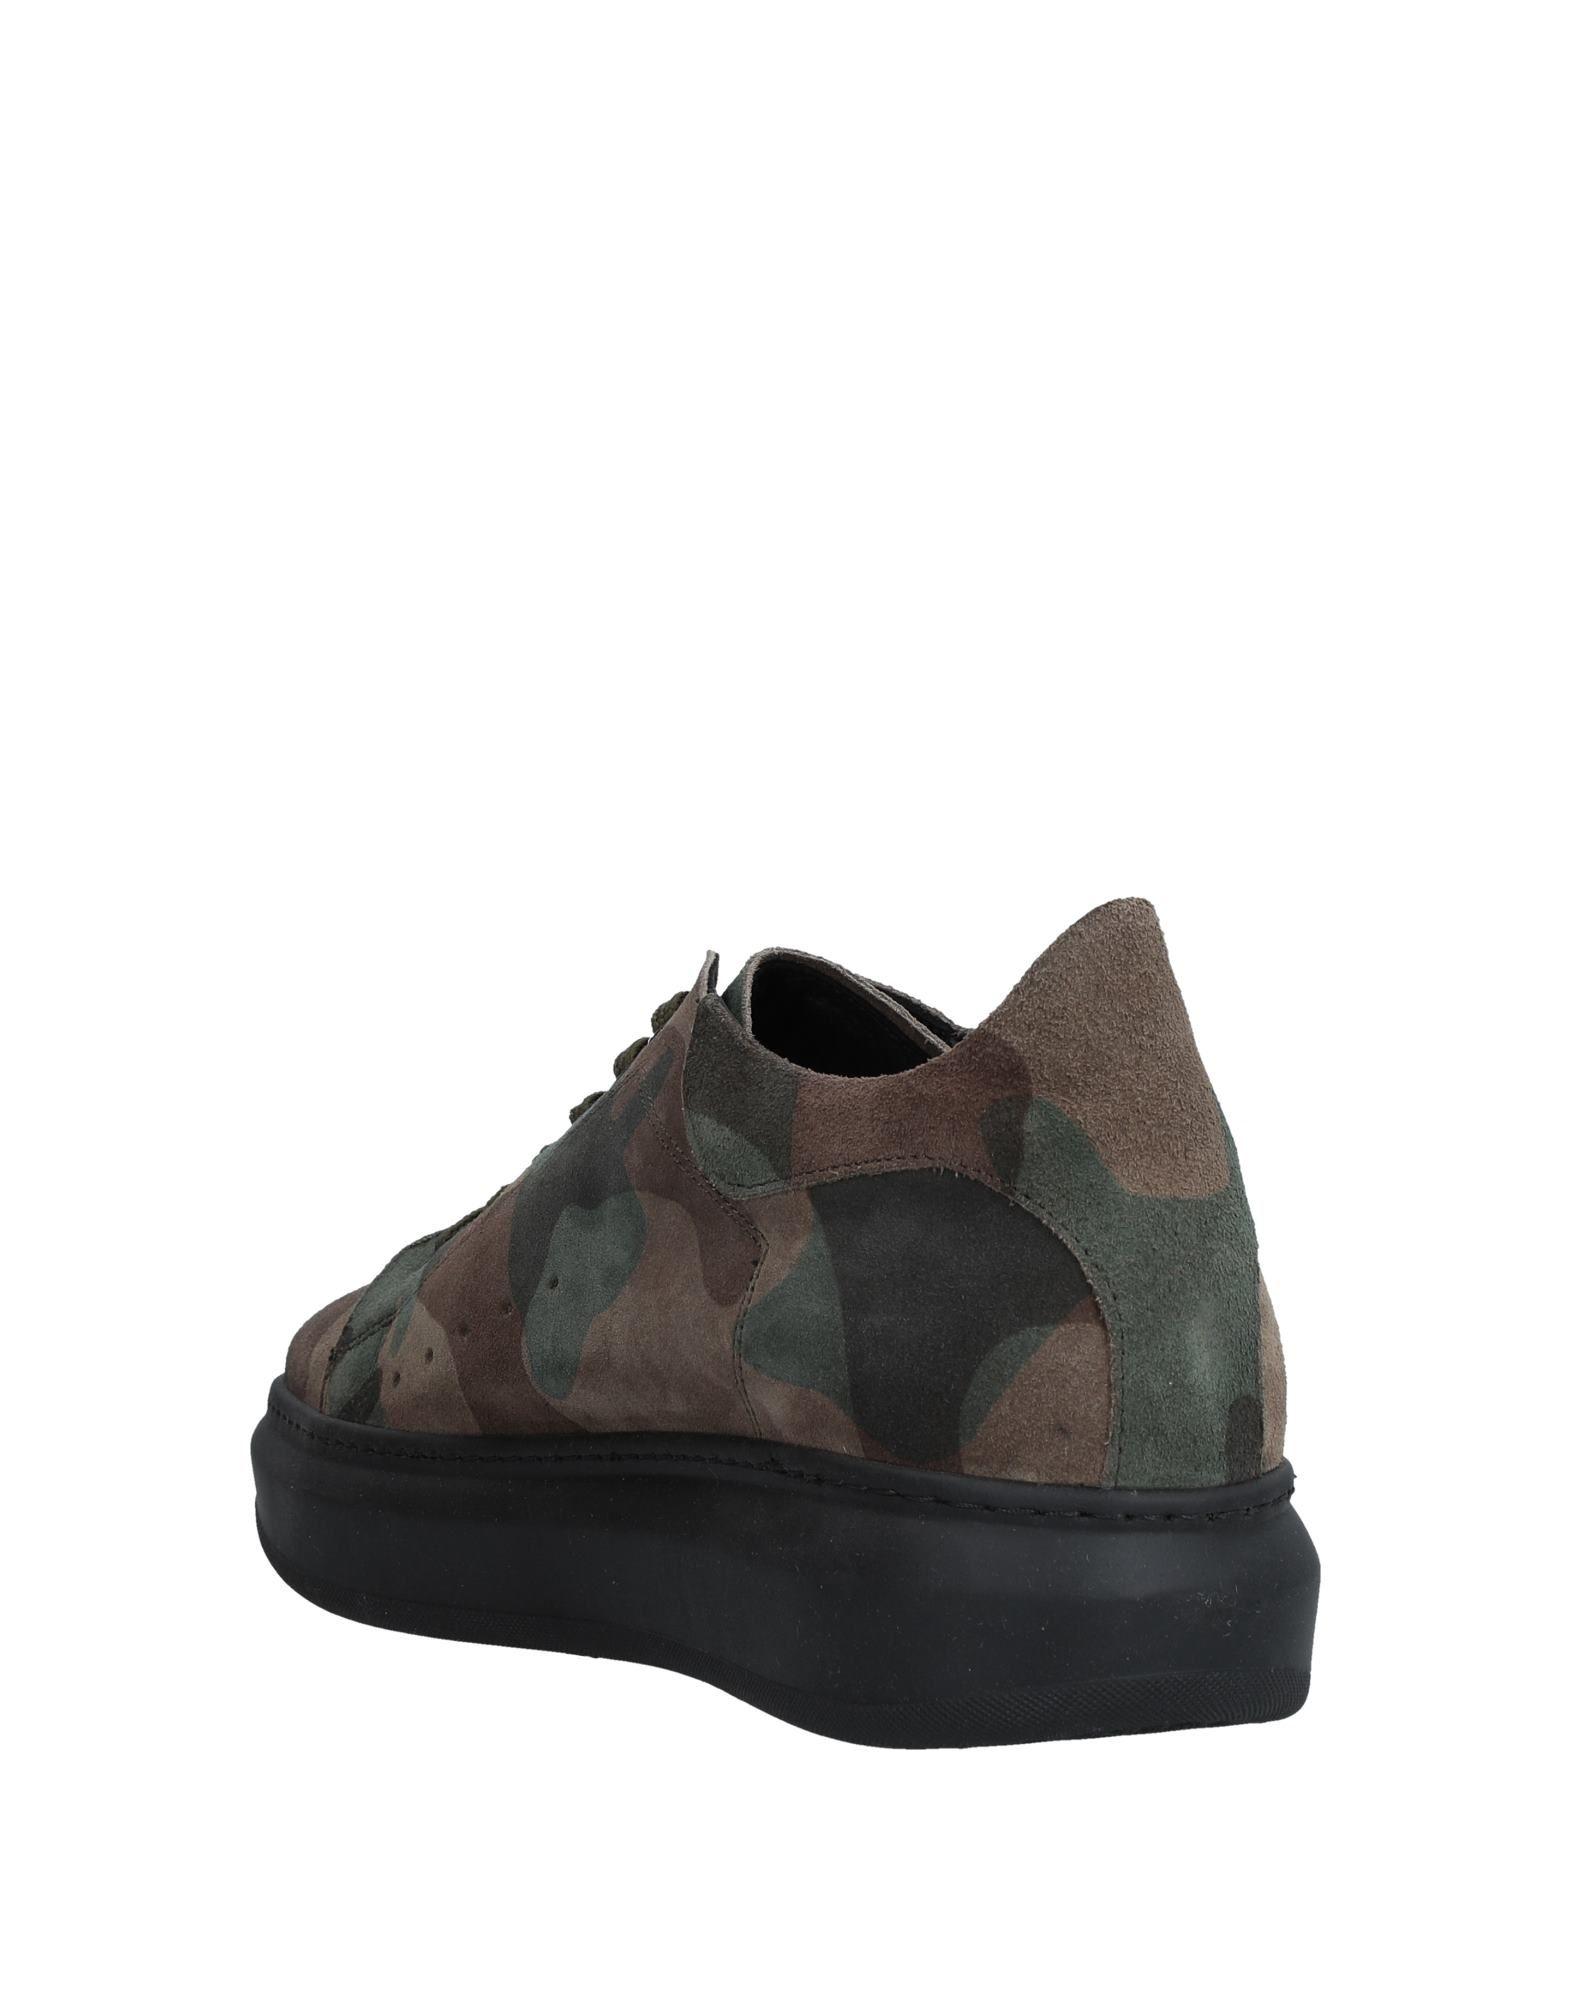 Bottega Sneakers Marchigiana Sneakers Bottega Herren  11542305CJ 01713d